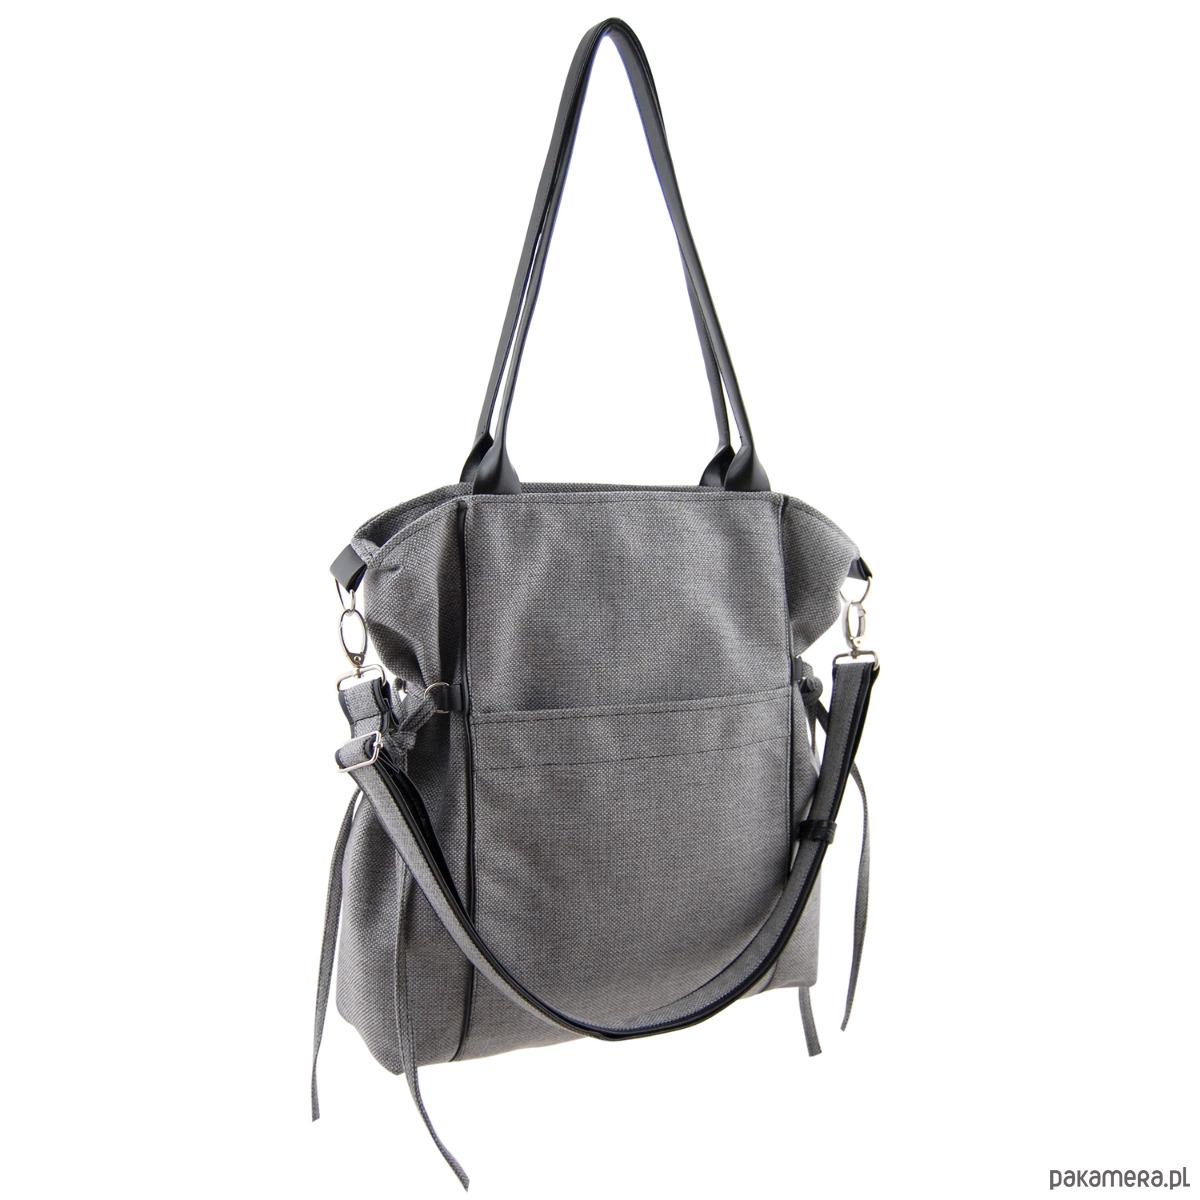 6a6aa39b46d42 AMBER - duża torba - shopper - szara plecionka - torby na ramię ...